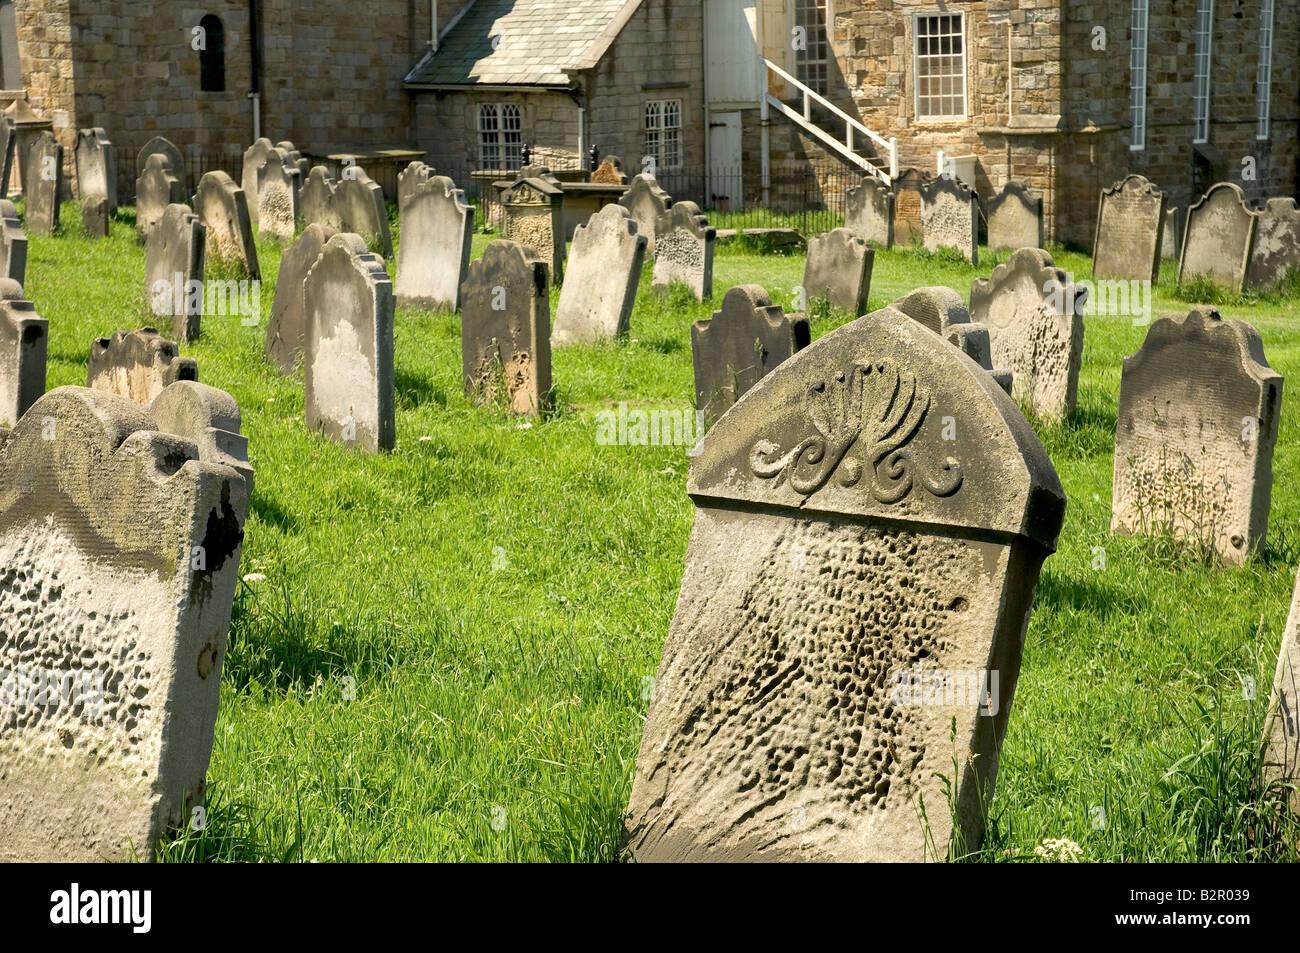 St Marys Church graveyard Whitby North Yorkshire England UK United Kingdom GB Great Britain Stock Photo